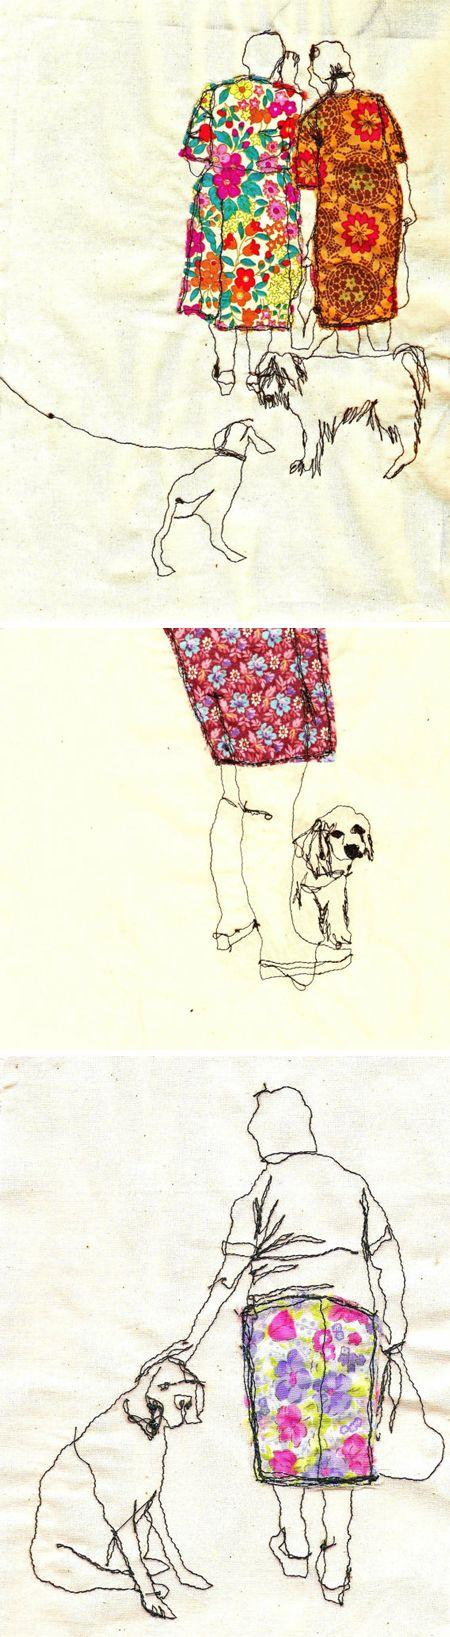 curated contemporary art  /// i'm jealous of sarah walton